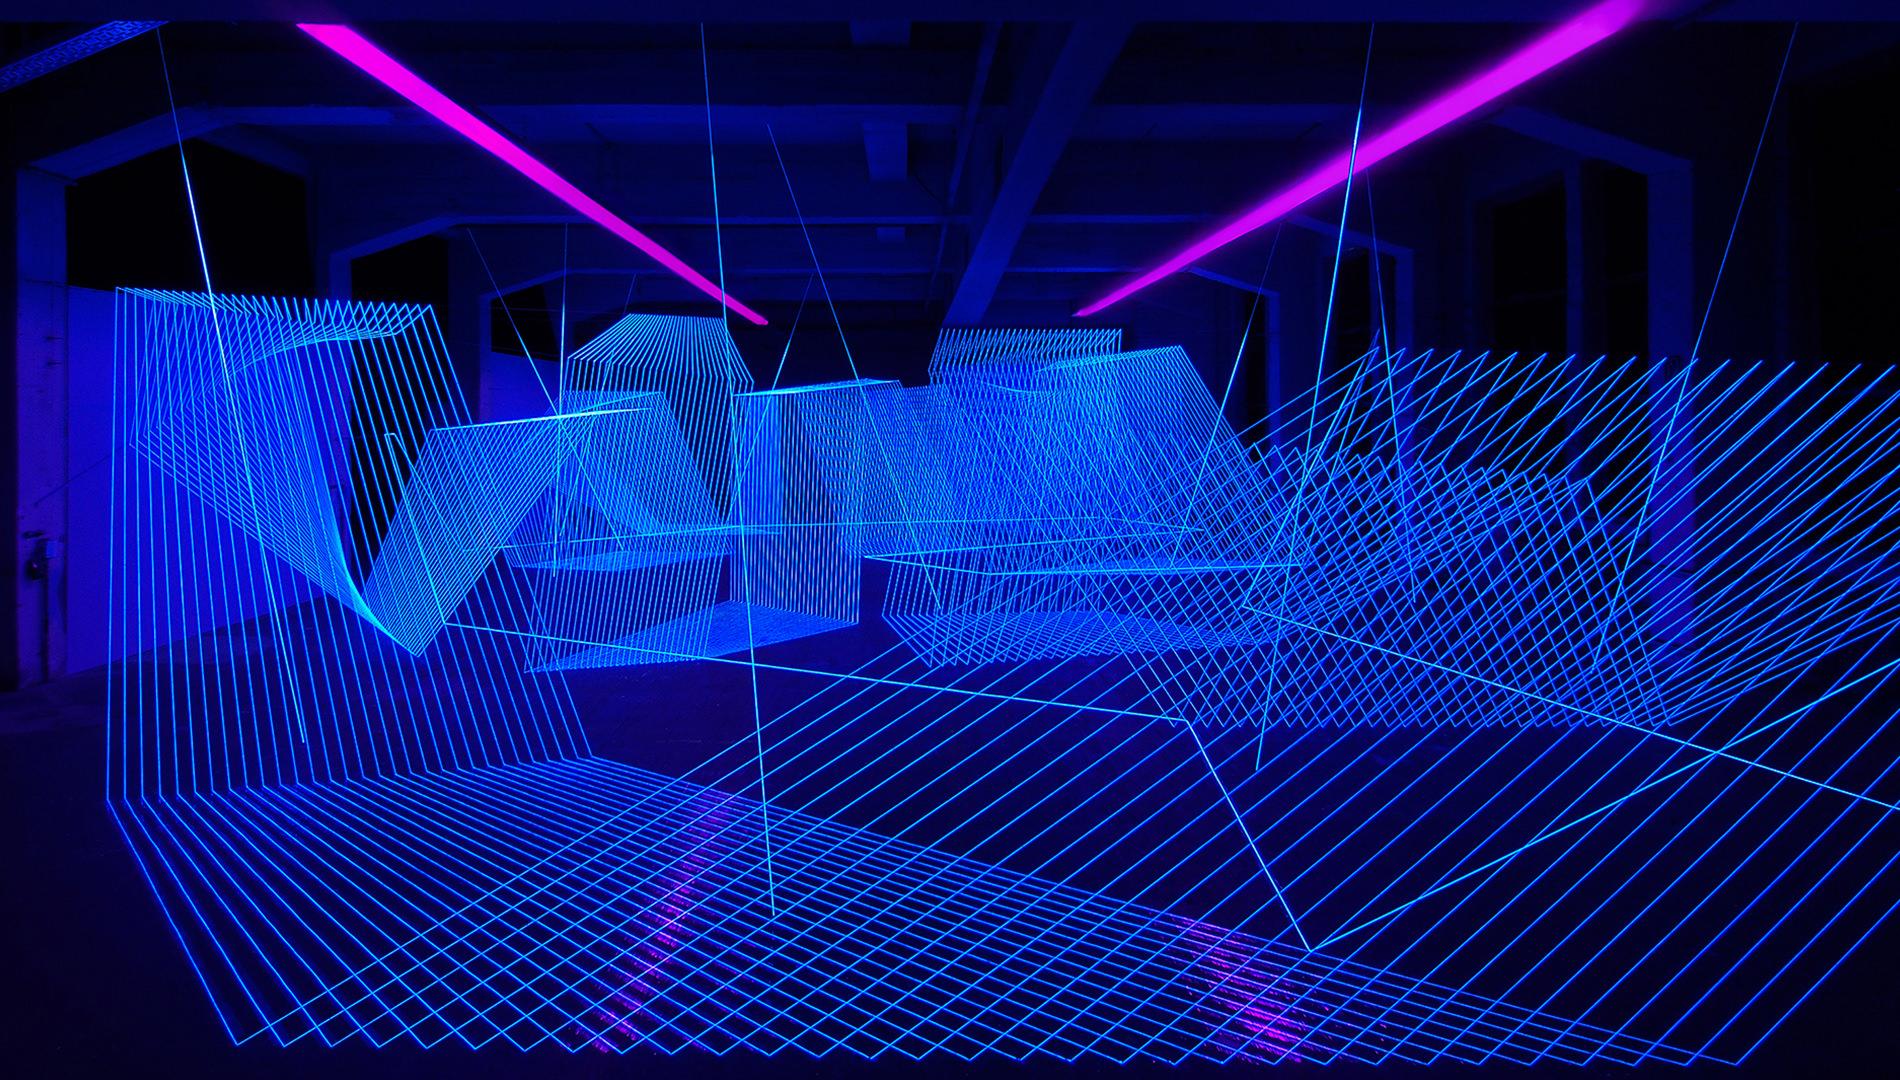 Messe Design Live Kommunikation Hamburg Berlin Köln Olympus Photography Playground Laser Jeongmoon Choi Going Places EventLabs